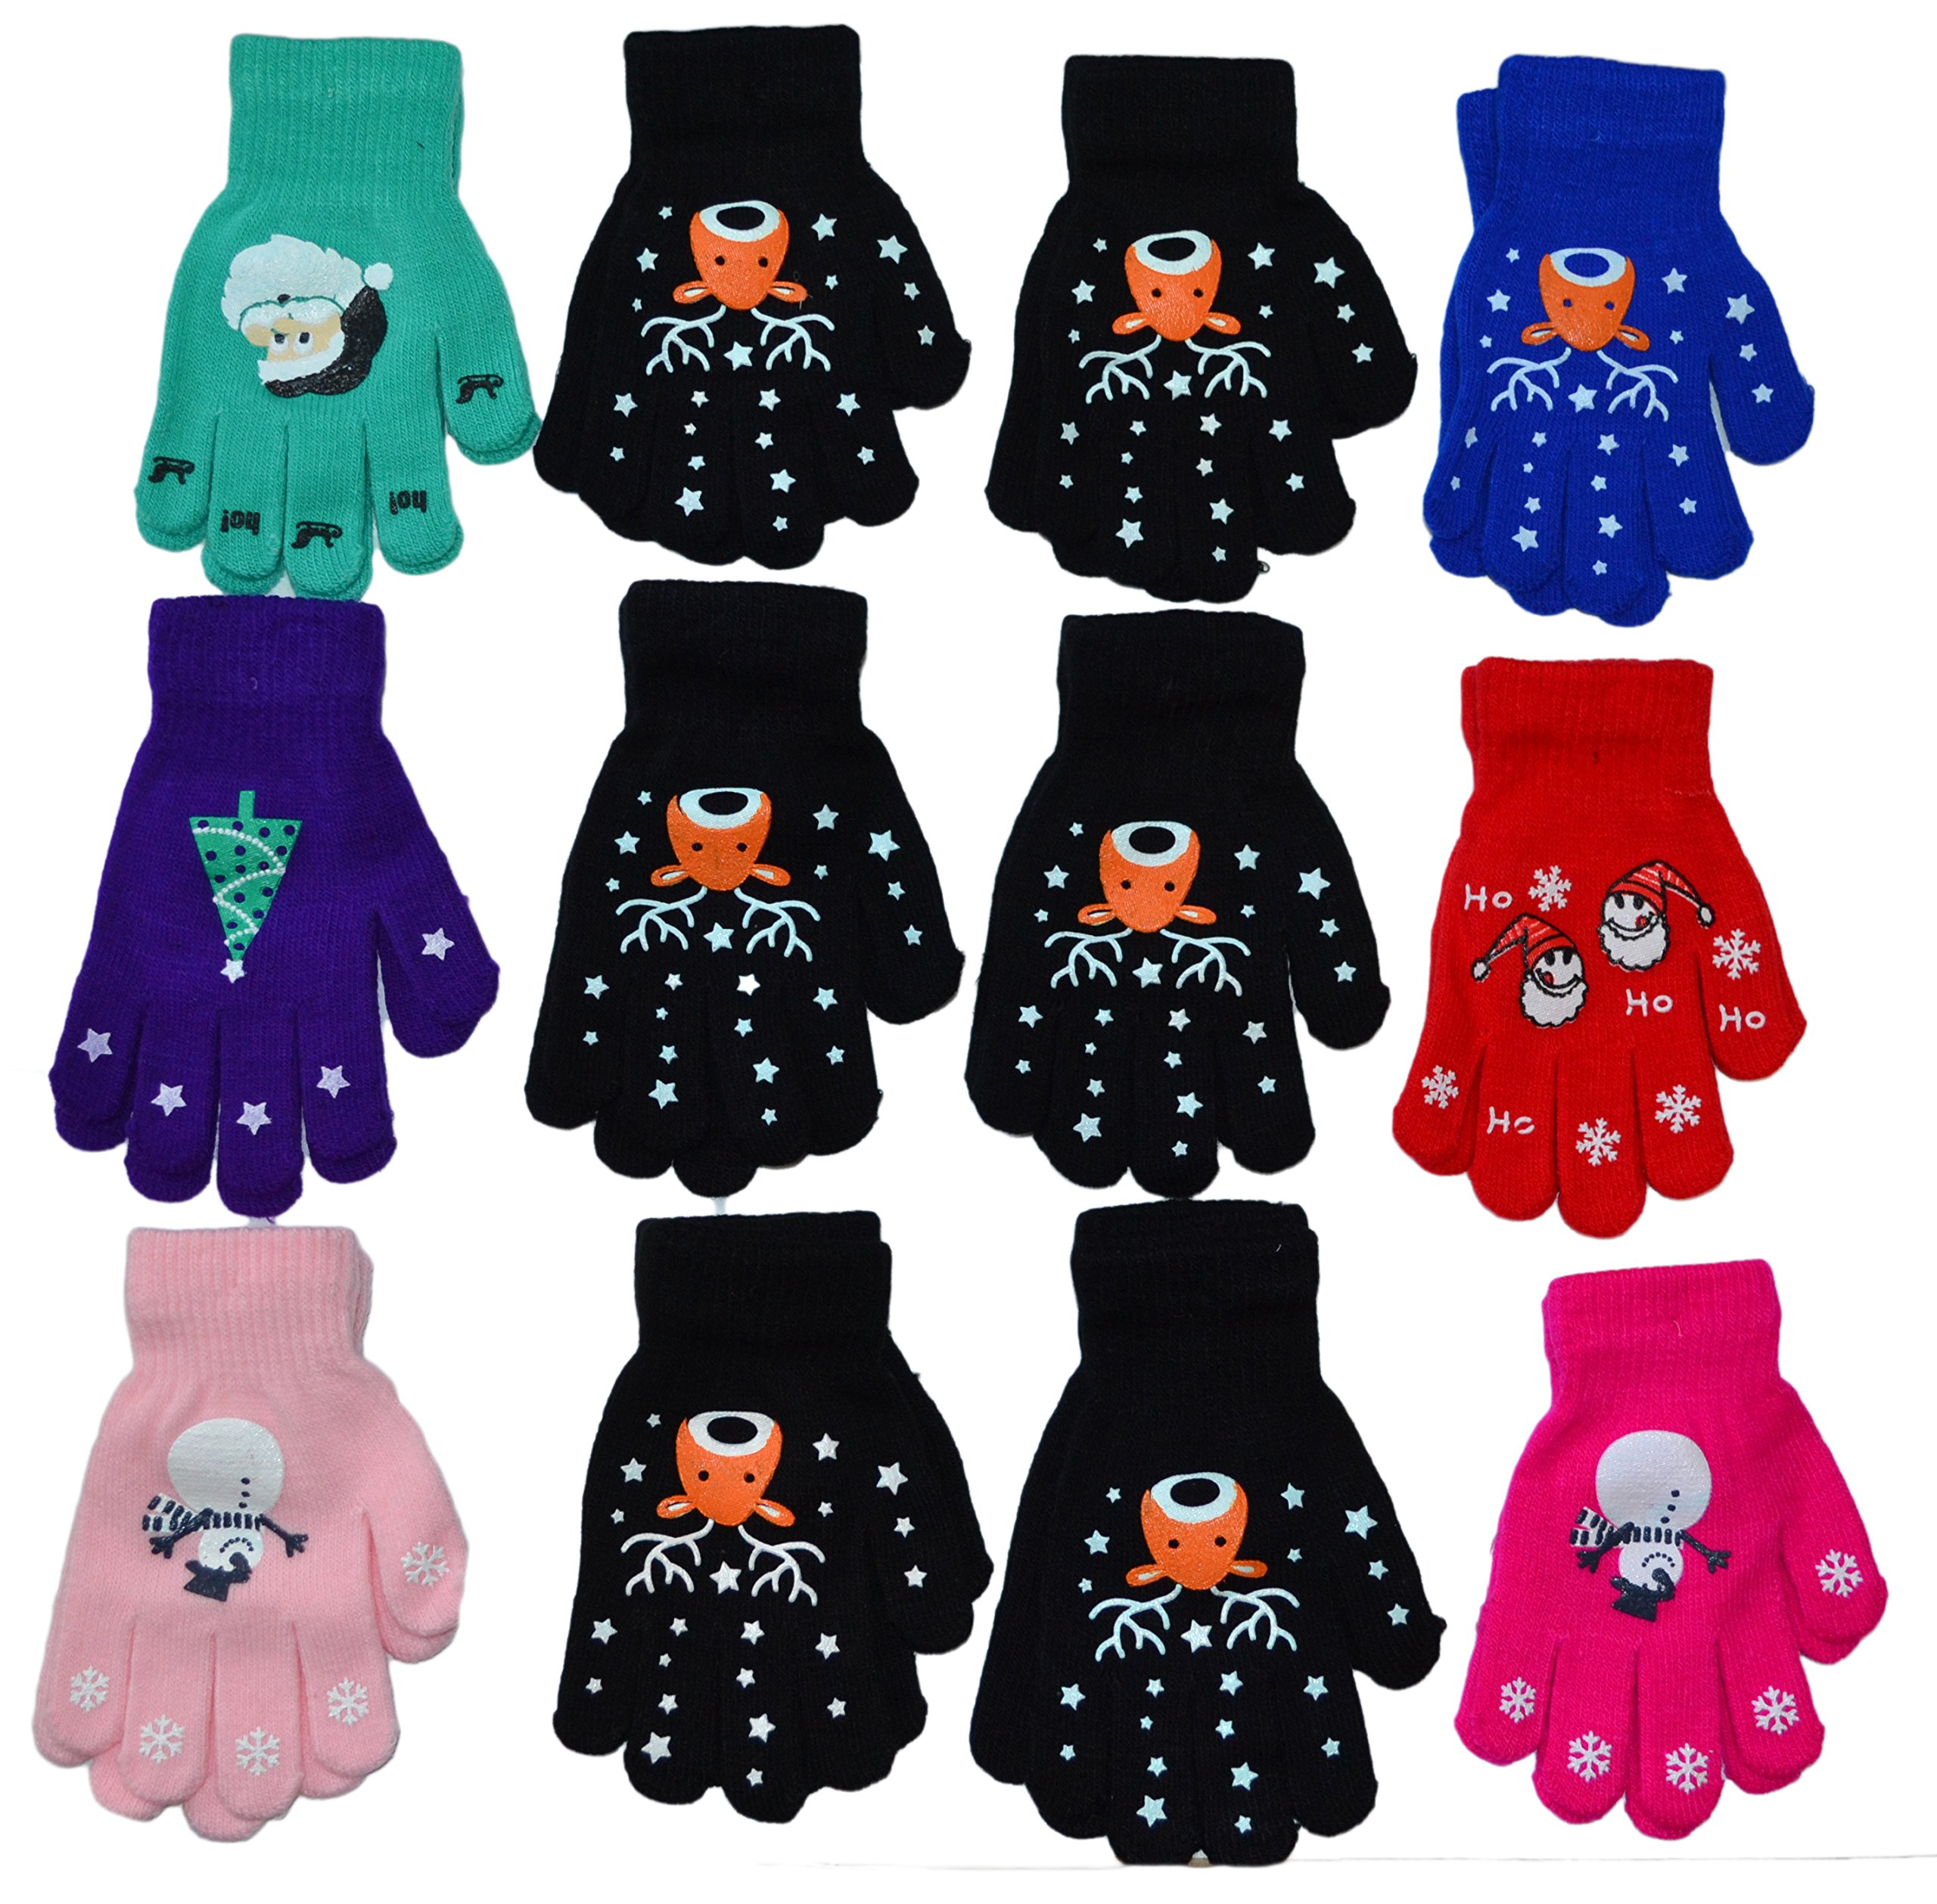 OPT Brand. Kids Magic Grabber Gloves Children Knit Christmas Gloves Wholesale 12 Pairs.